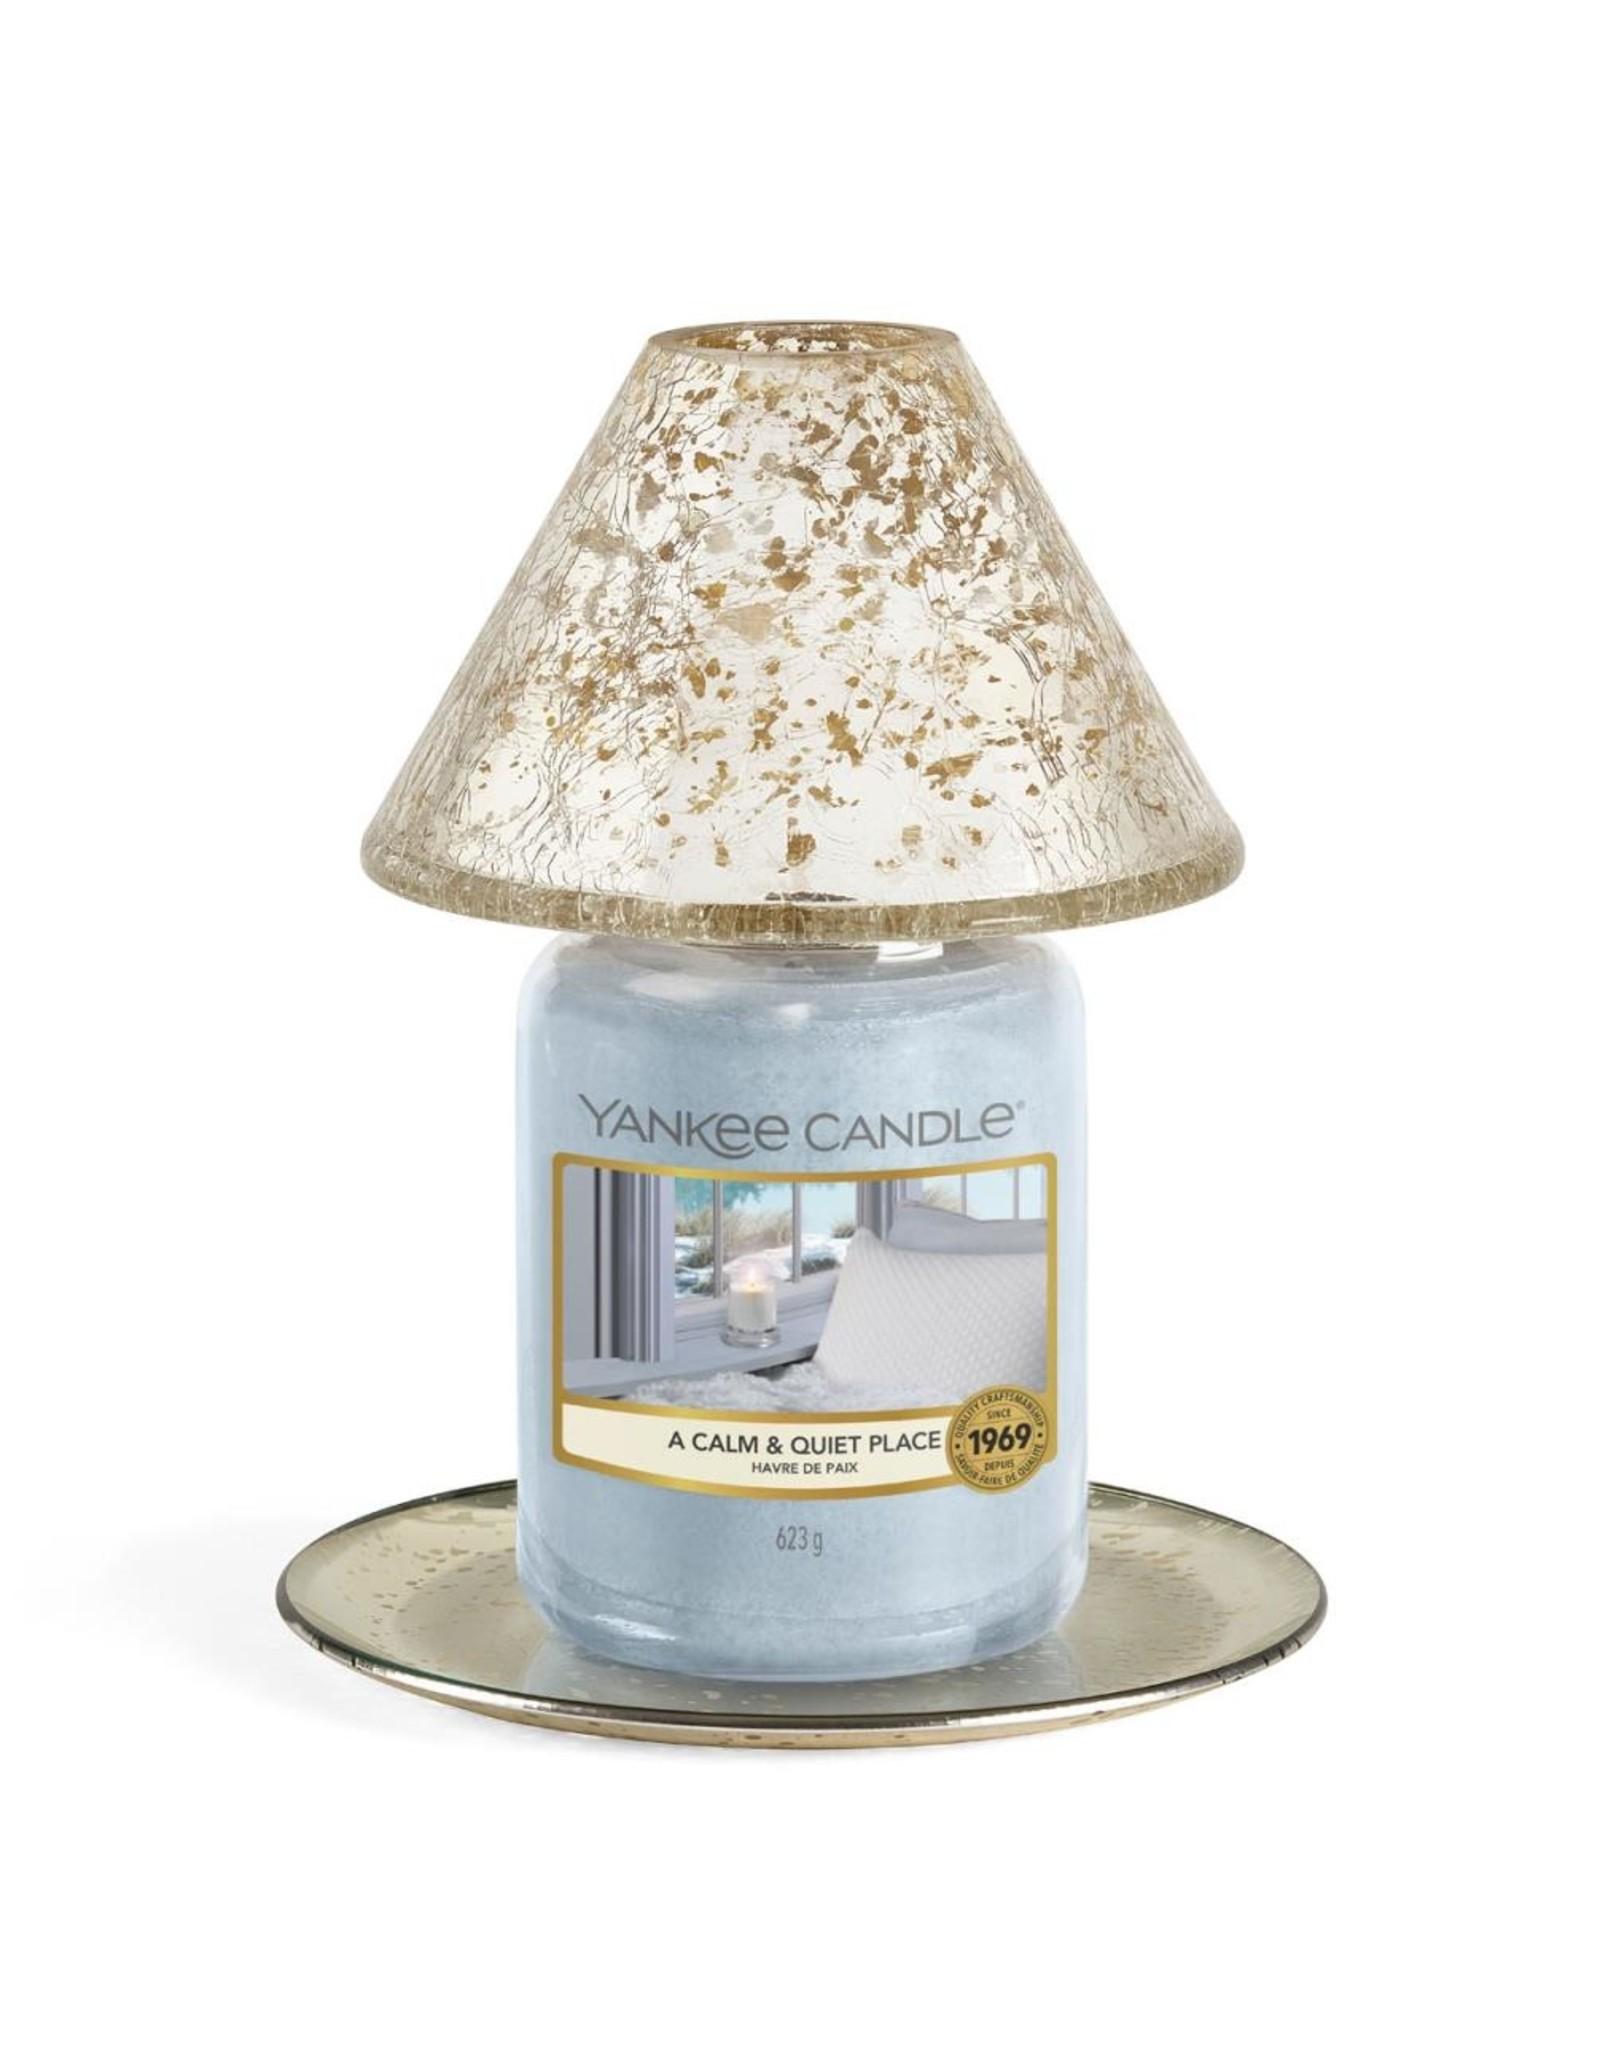 Yankee Candle Kensington - Large Shade & Tray Crackle